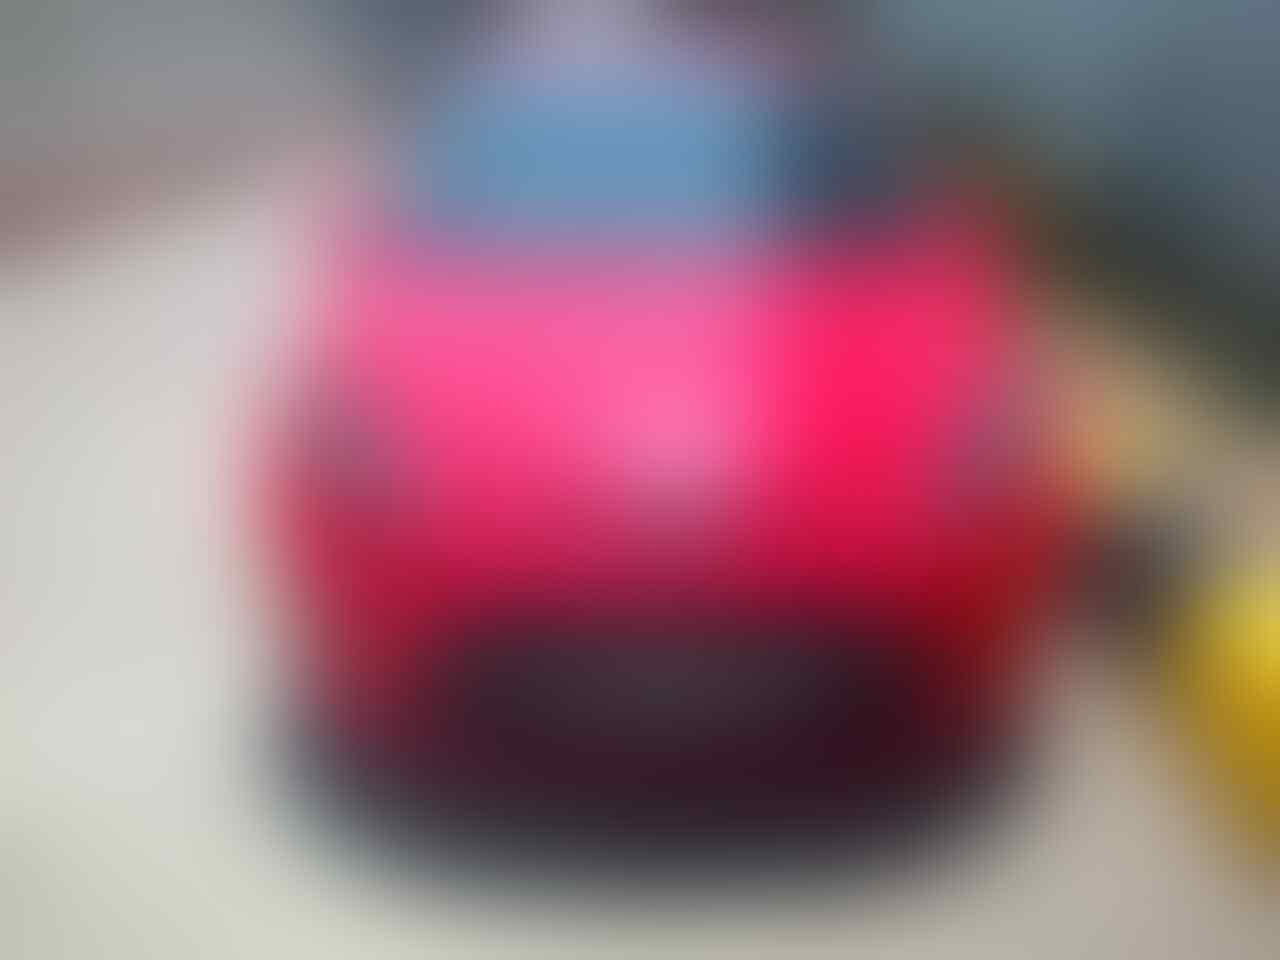 Jual Cepat Ford Fiesta Trend Automatic th.2011 hanya Rp. 162.000.000